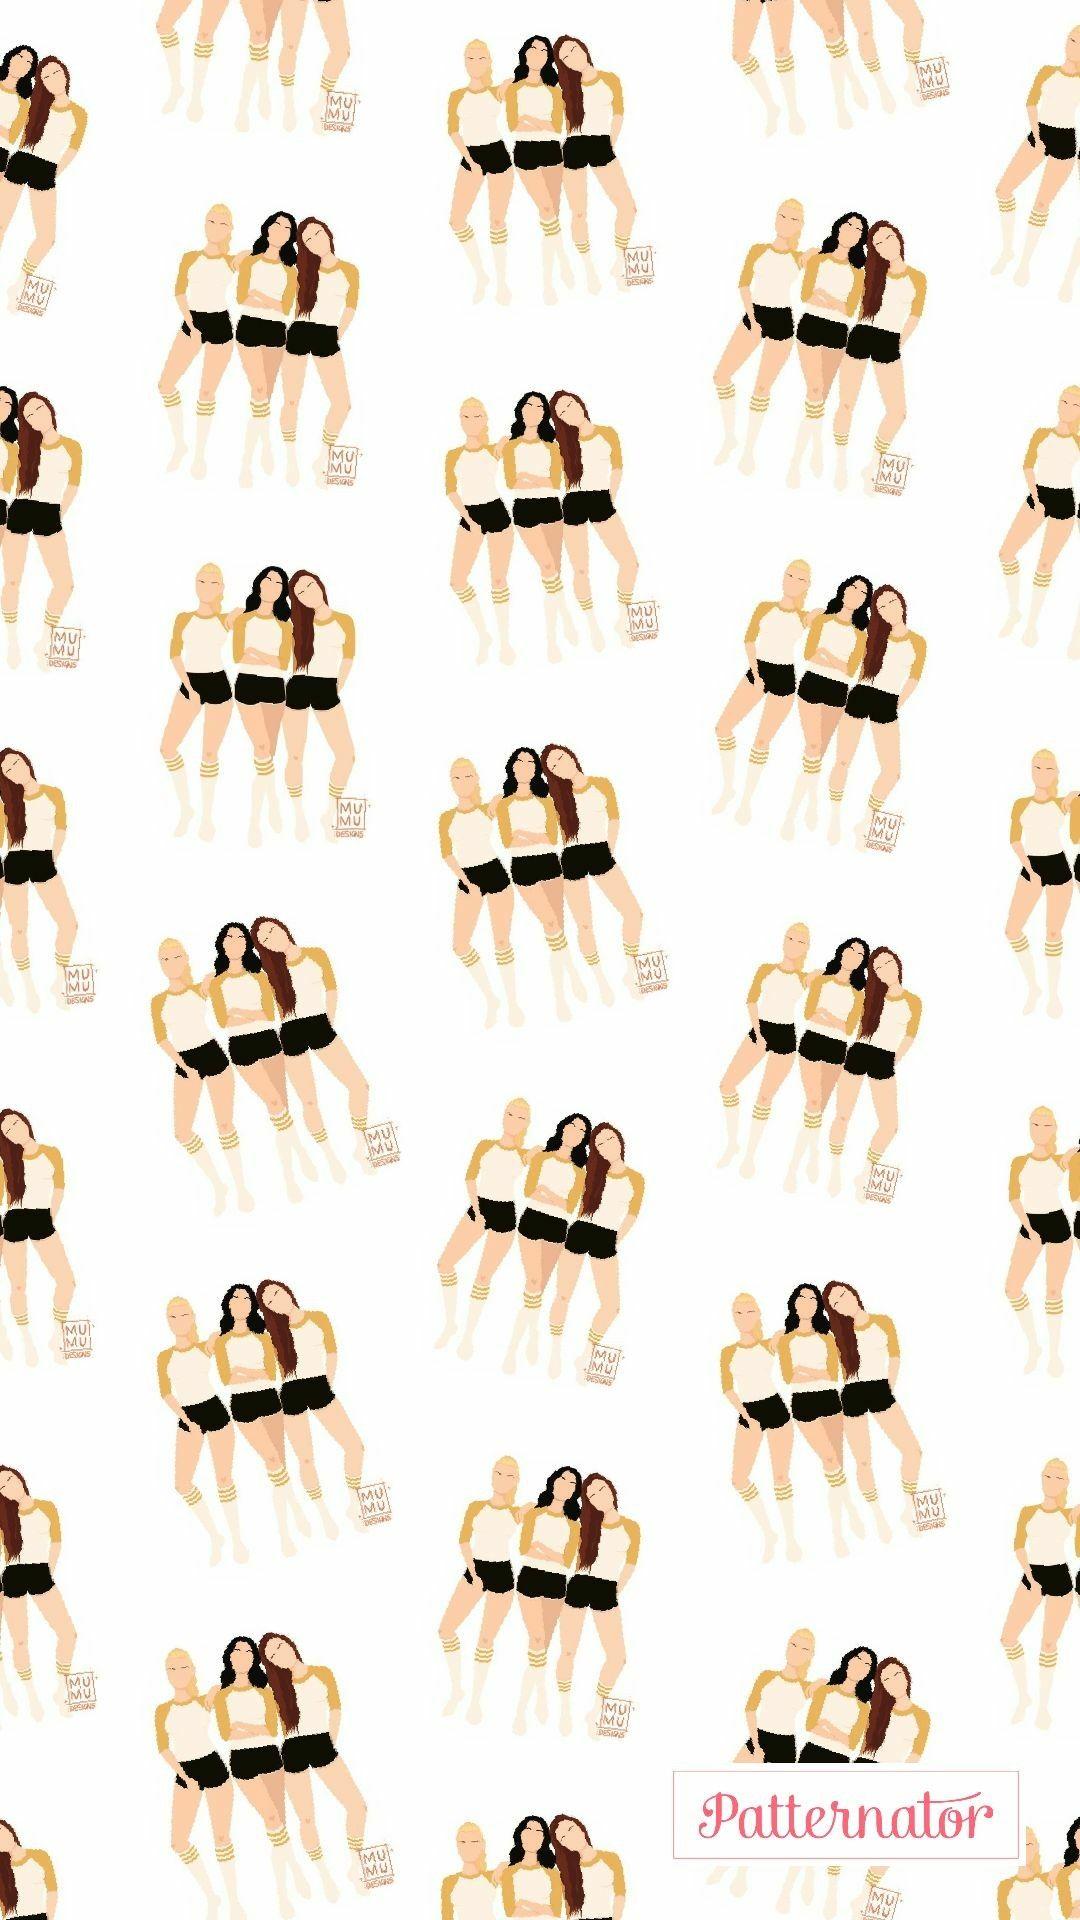 Wallpaper Riverdale Girls 2 Papel de parede do